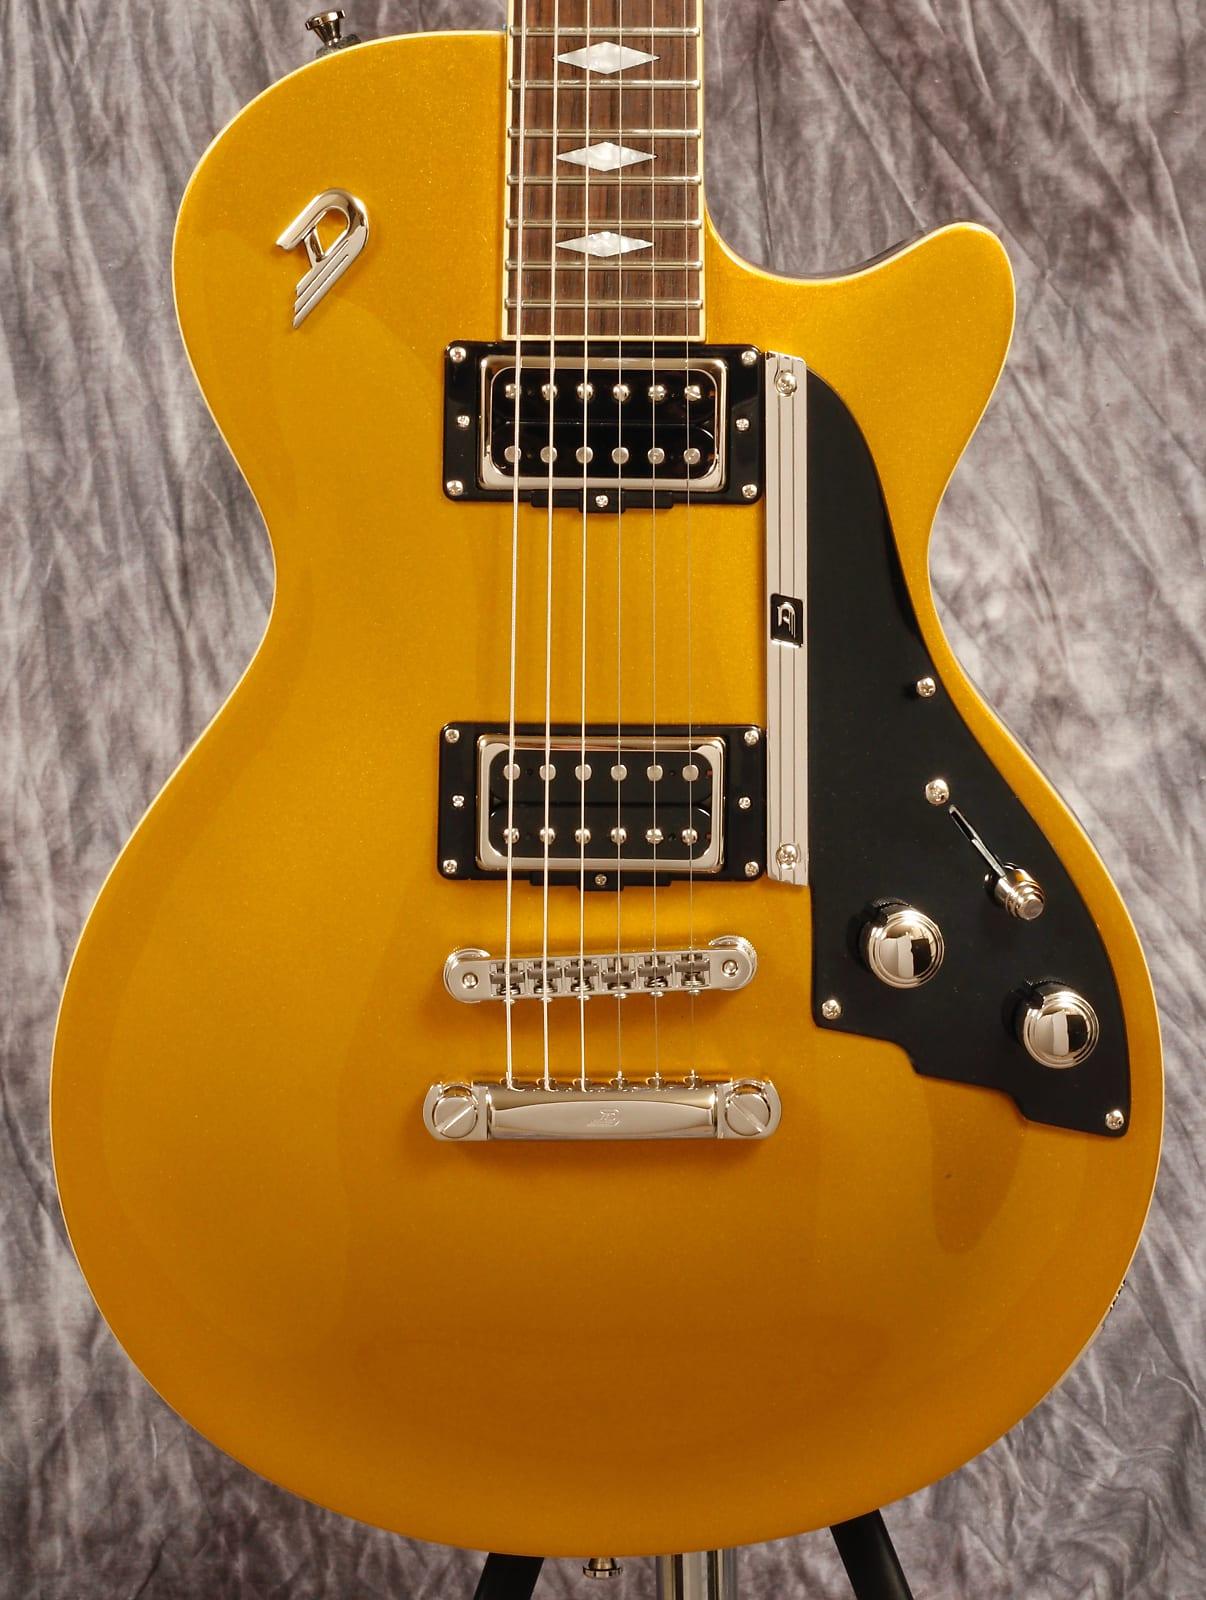 Duesenberg 59'er Gold Top